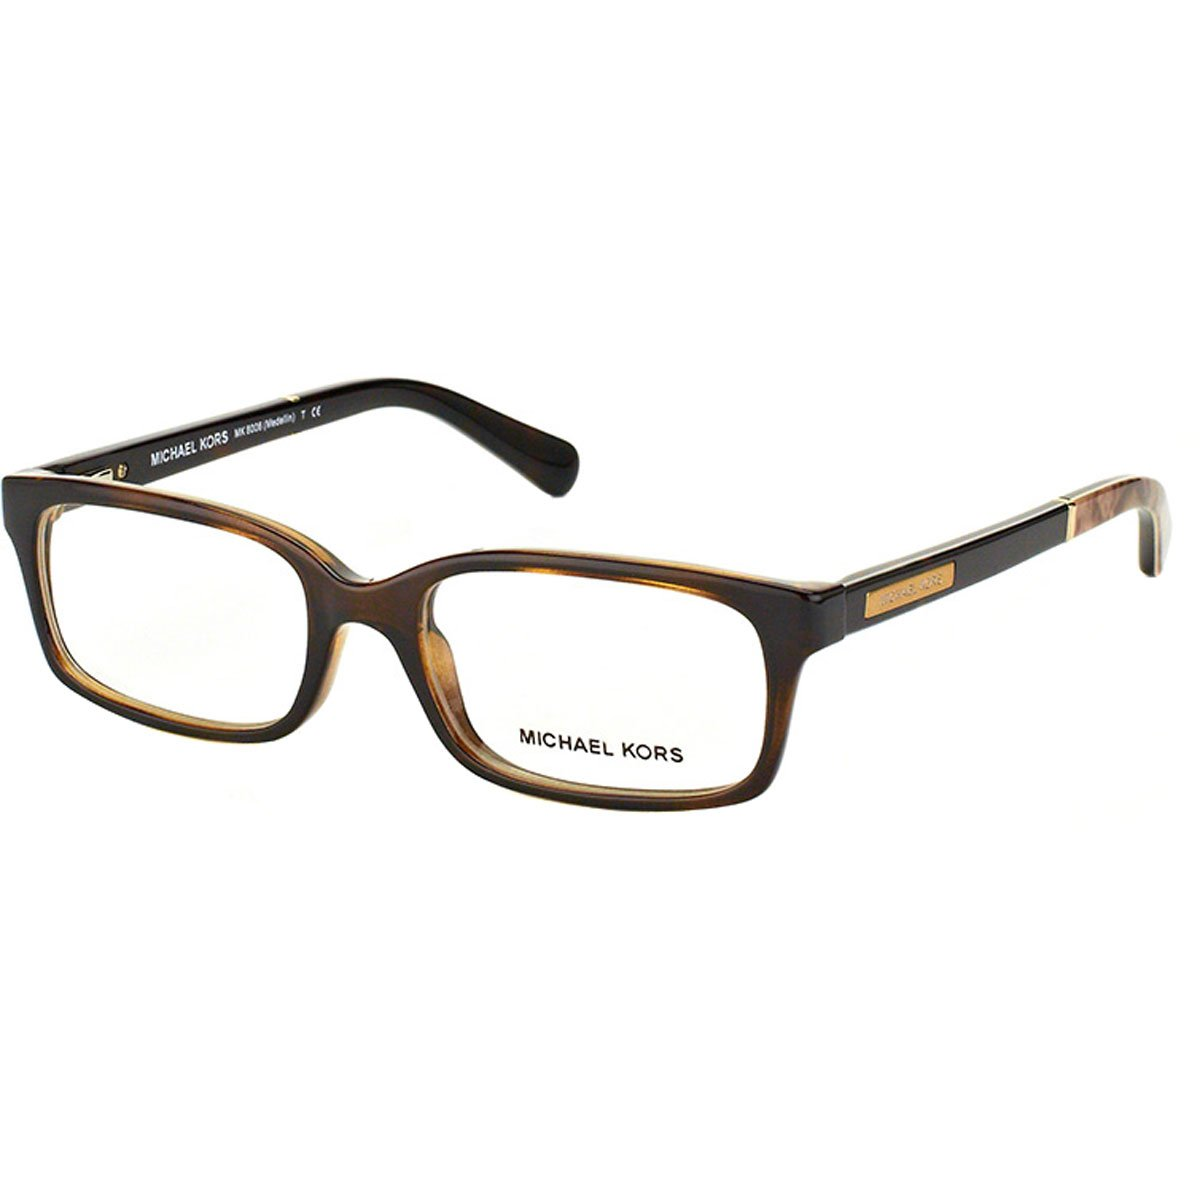 Amazon.com: Michael Kors 0 mk8006 óptico Full Rim rectángulo ...